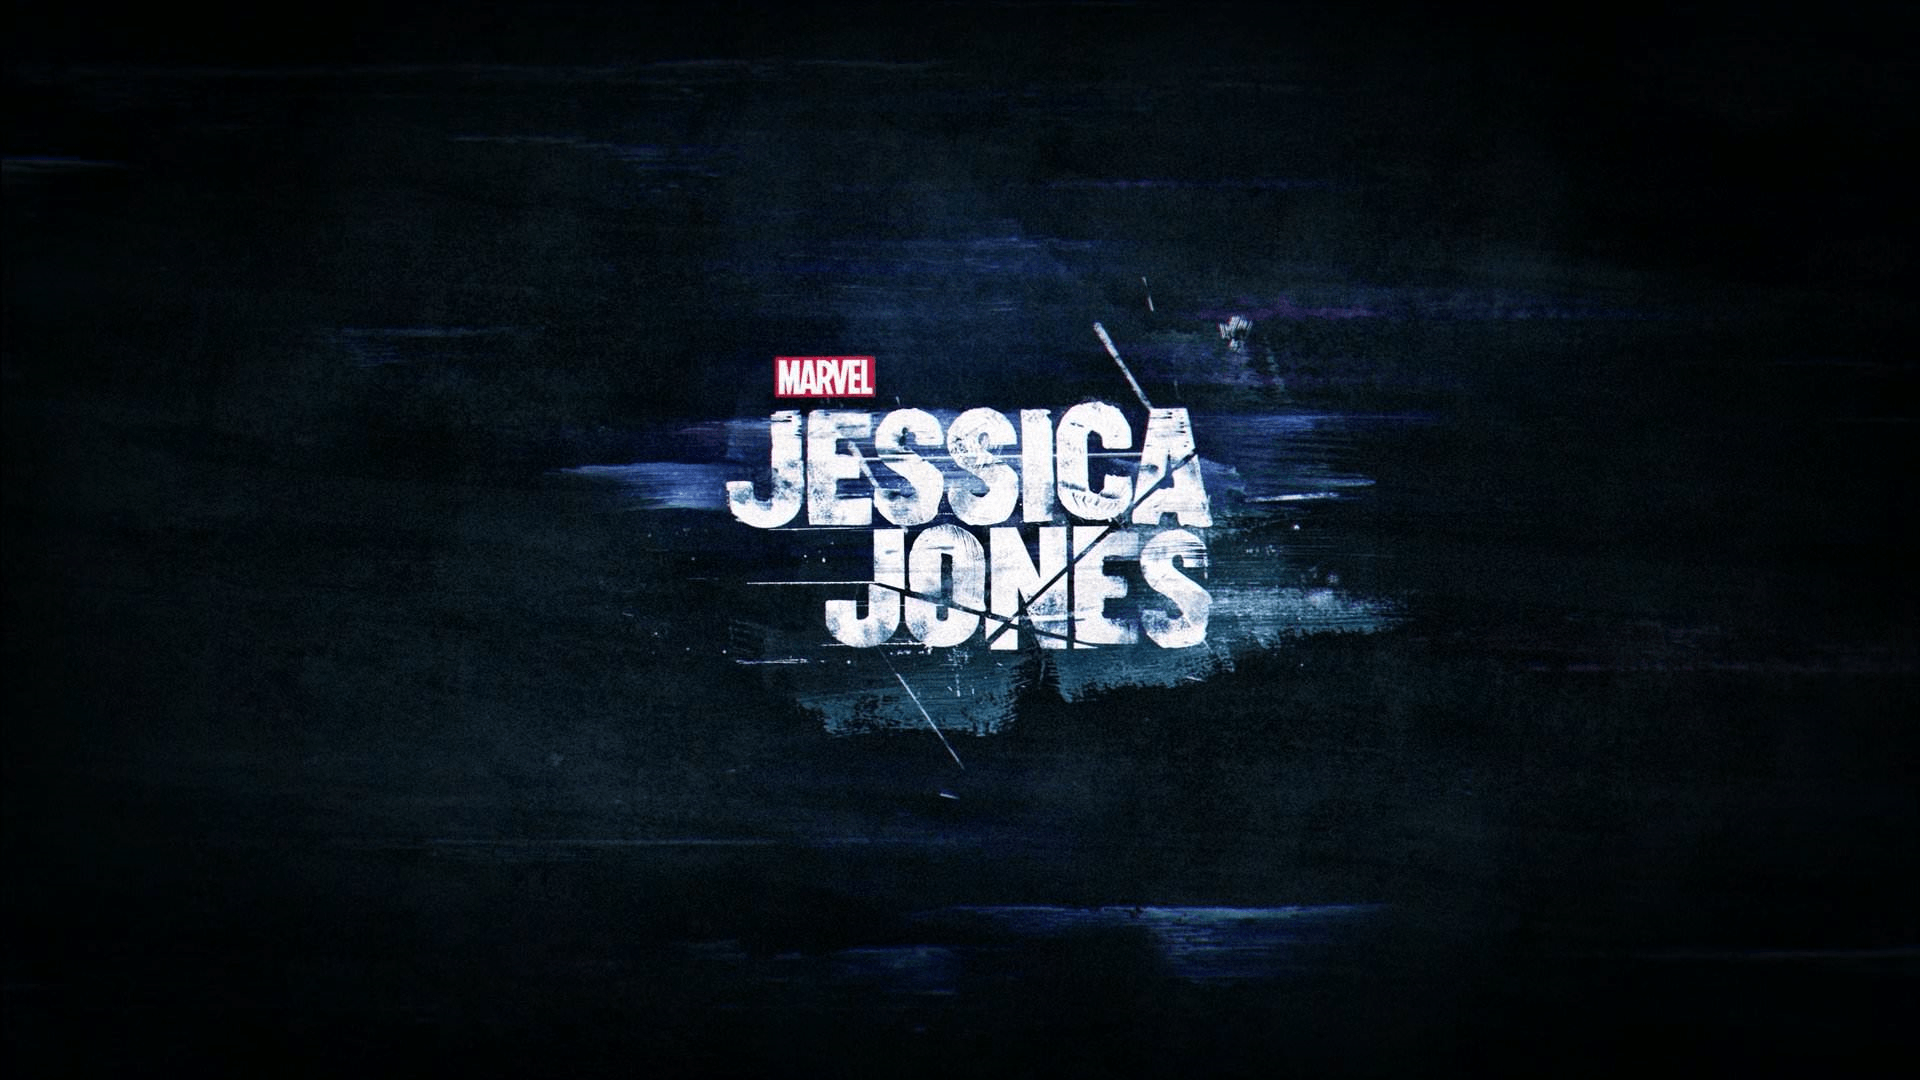 Jessica Jones Wallpapers - My Free Wallpapers Hub